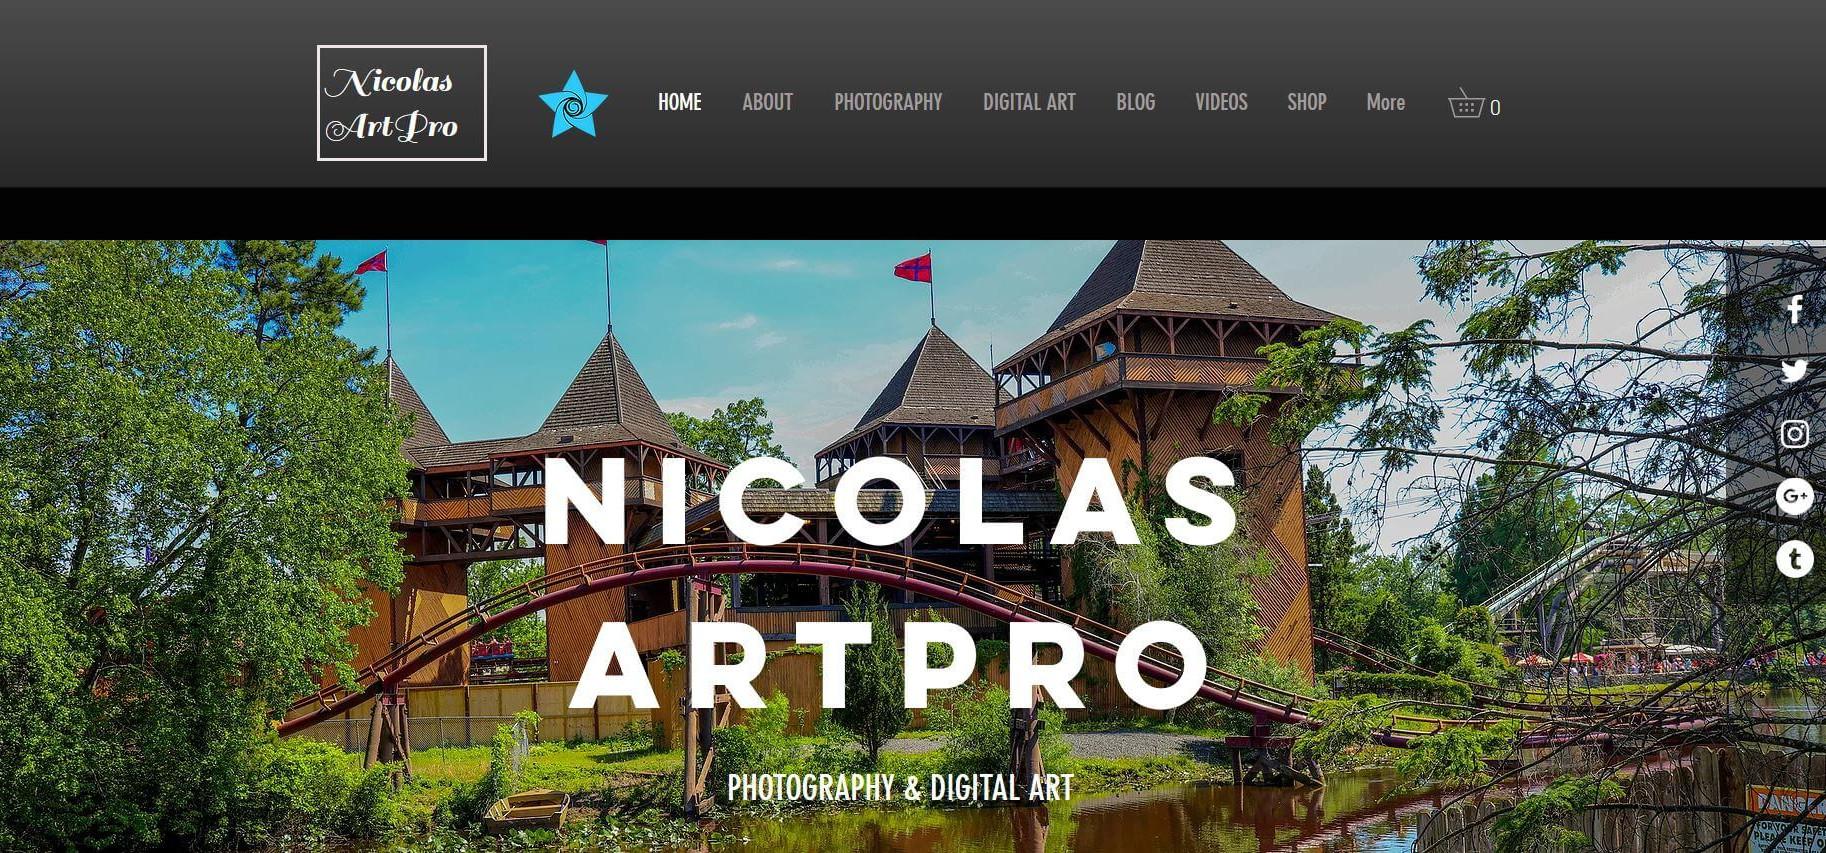 Webriseup: Nicolas ArtPro